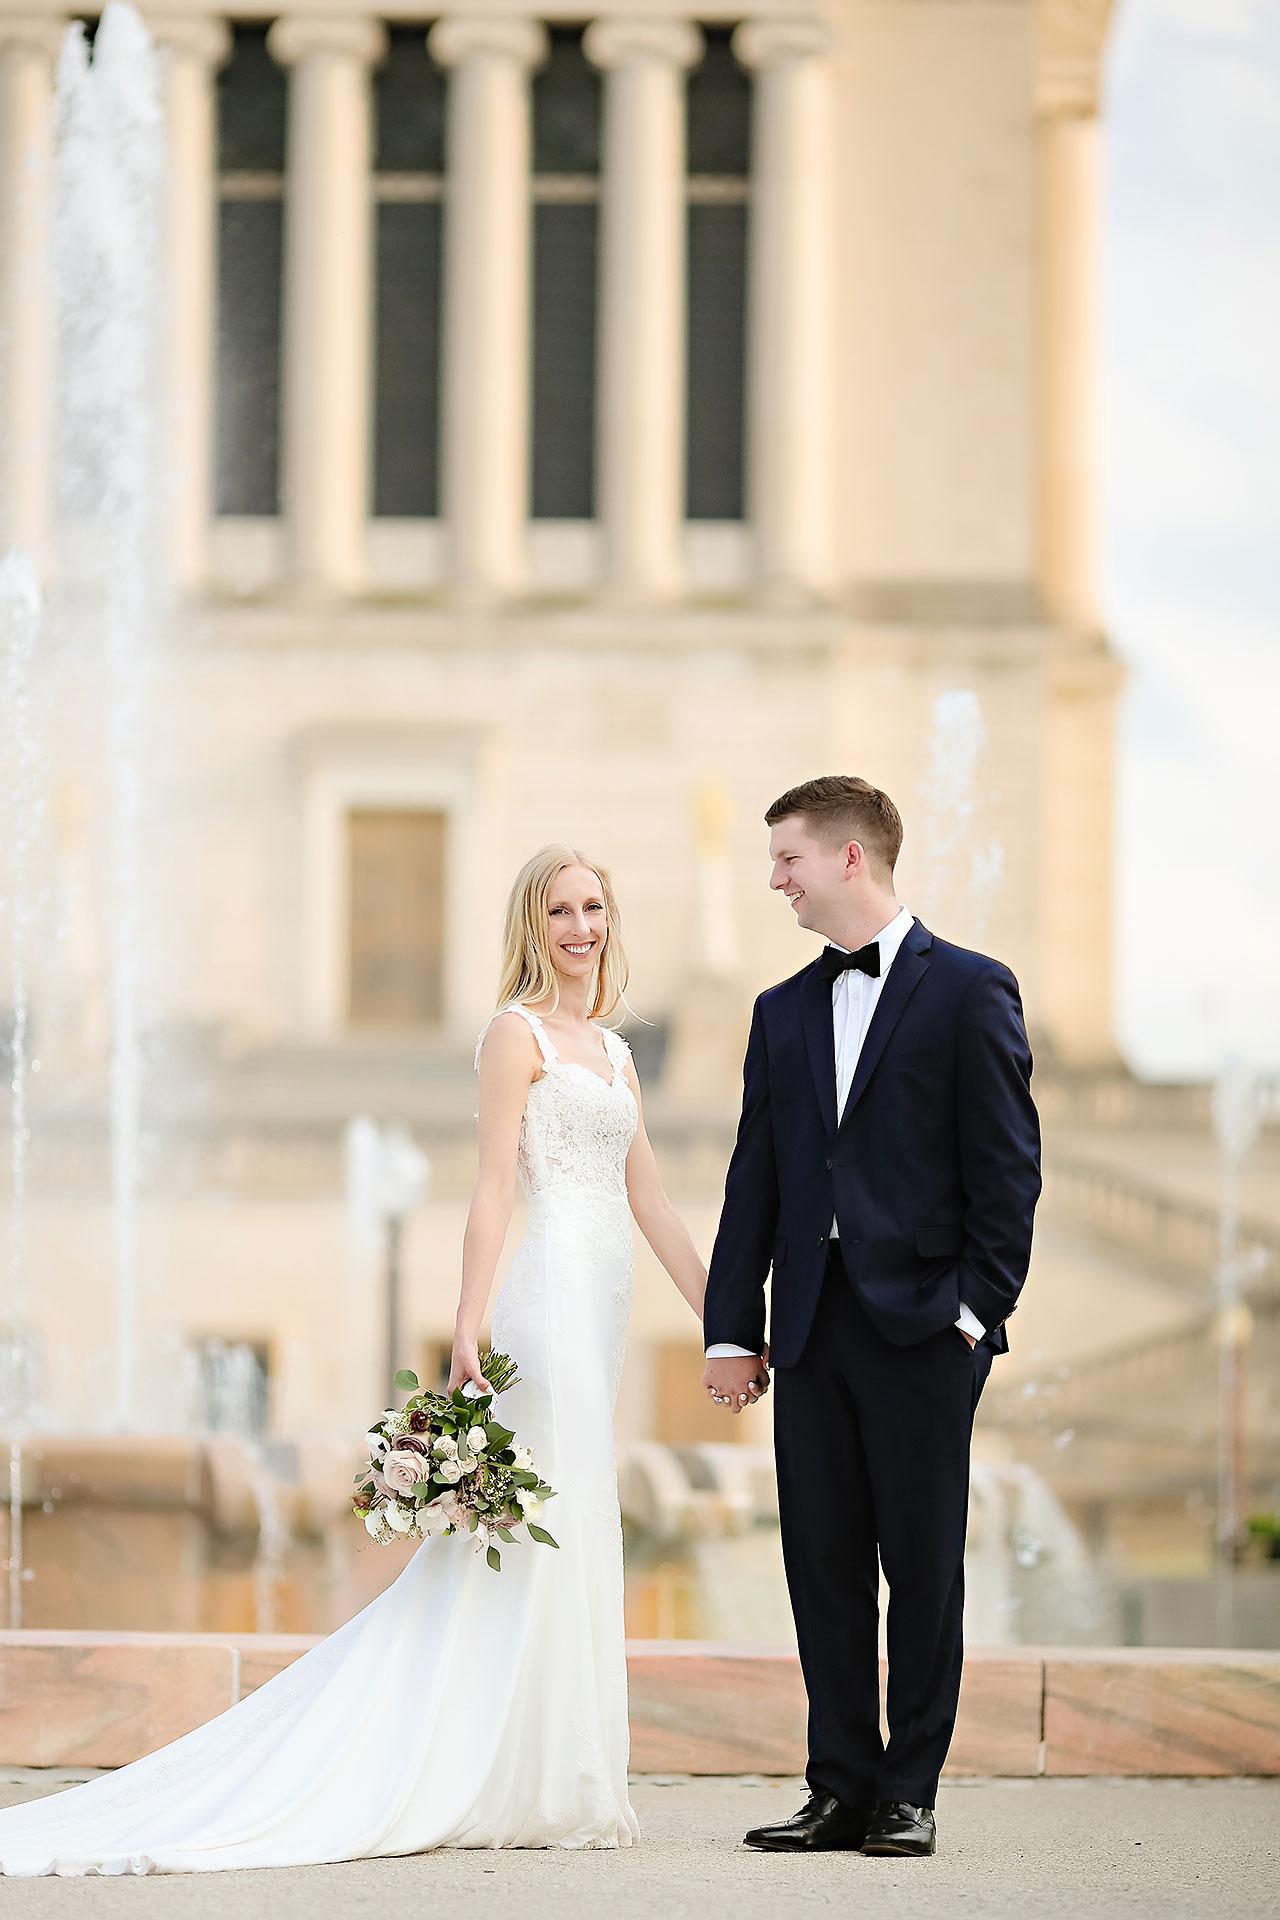 Molly Declan Scottish Rite Indianapolis Wedding 242